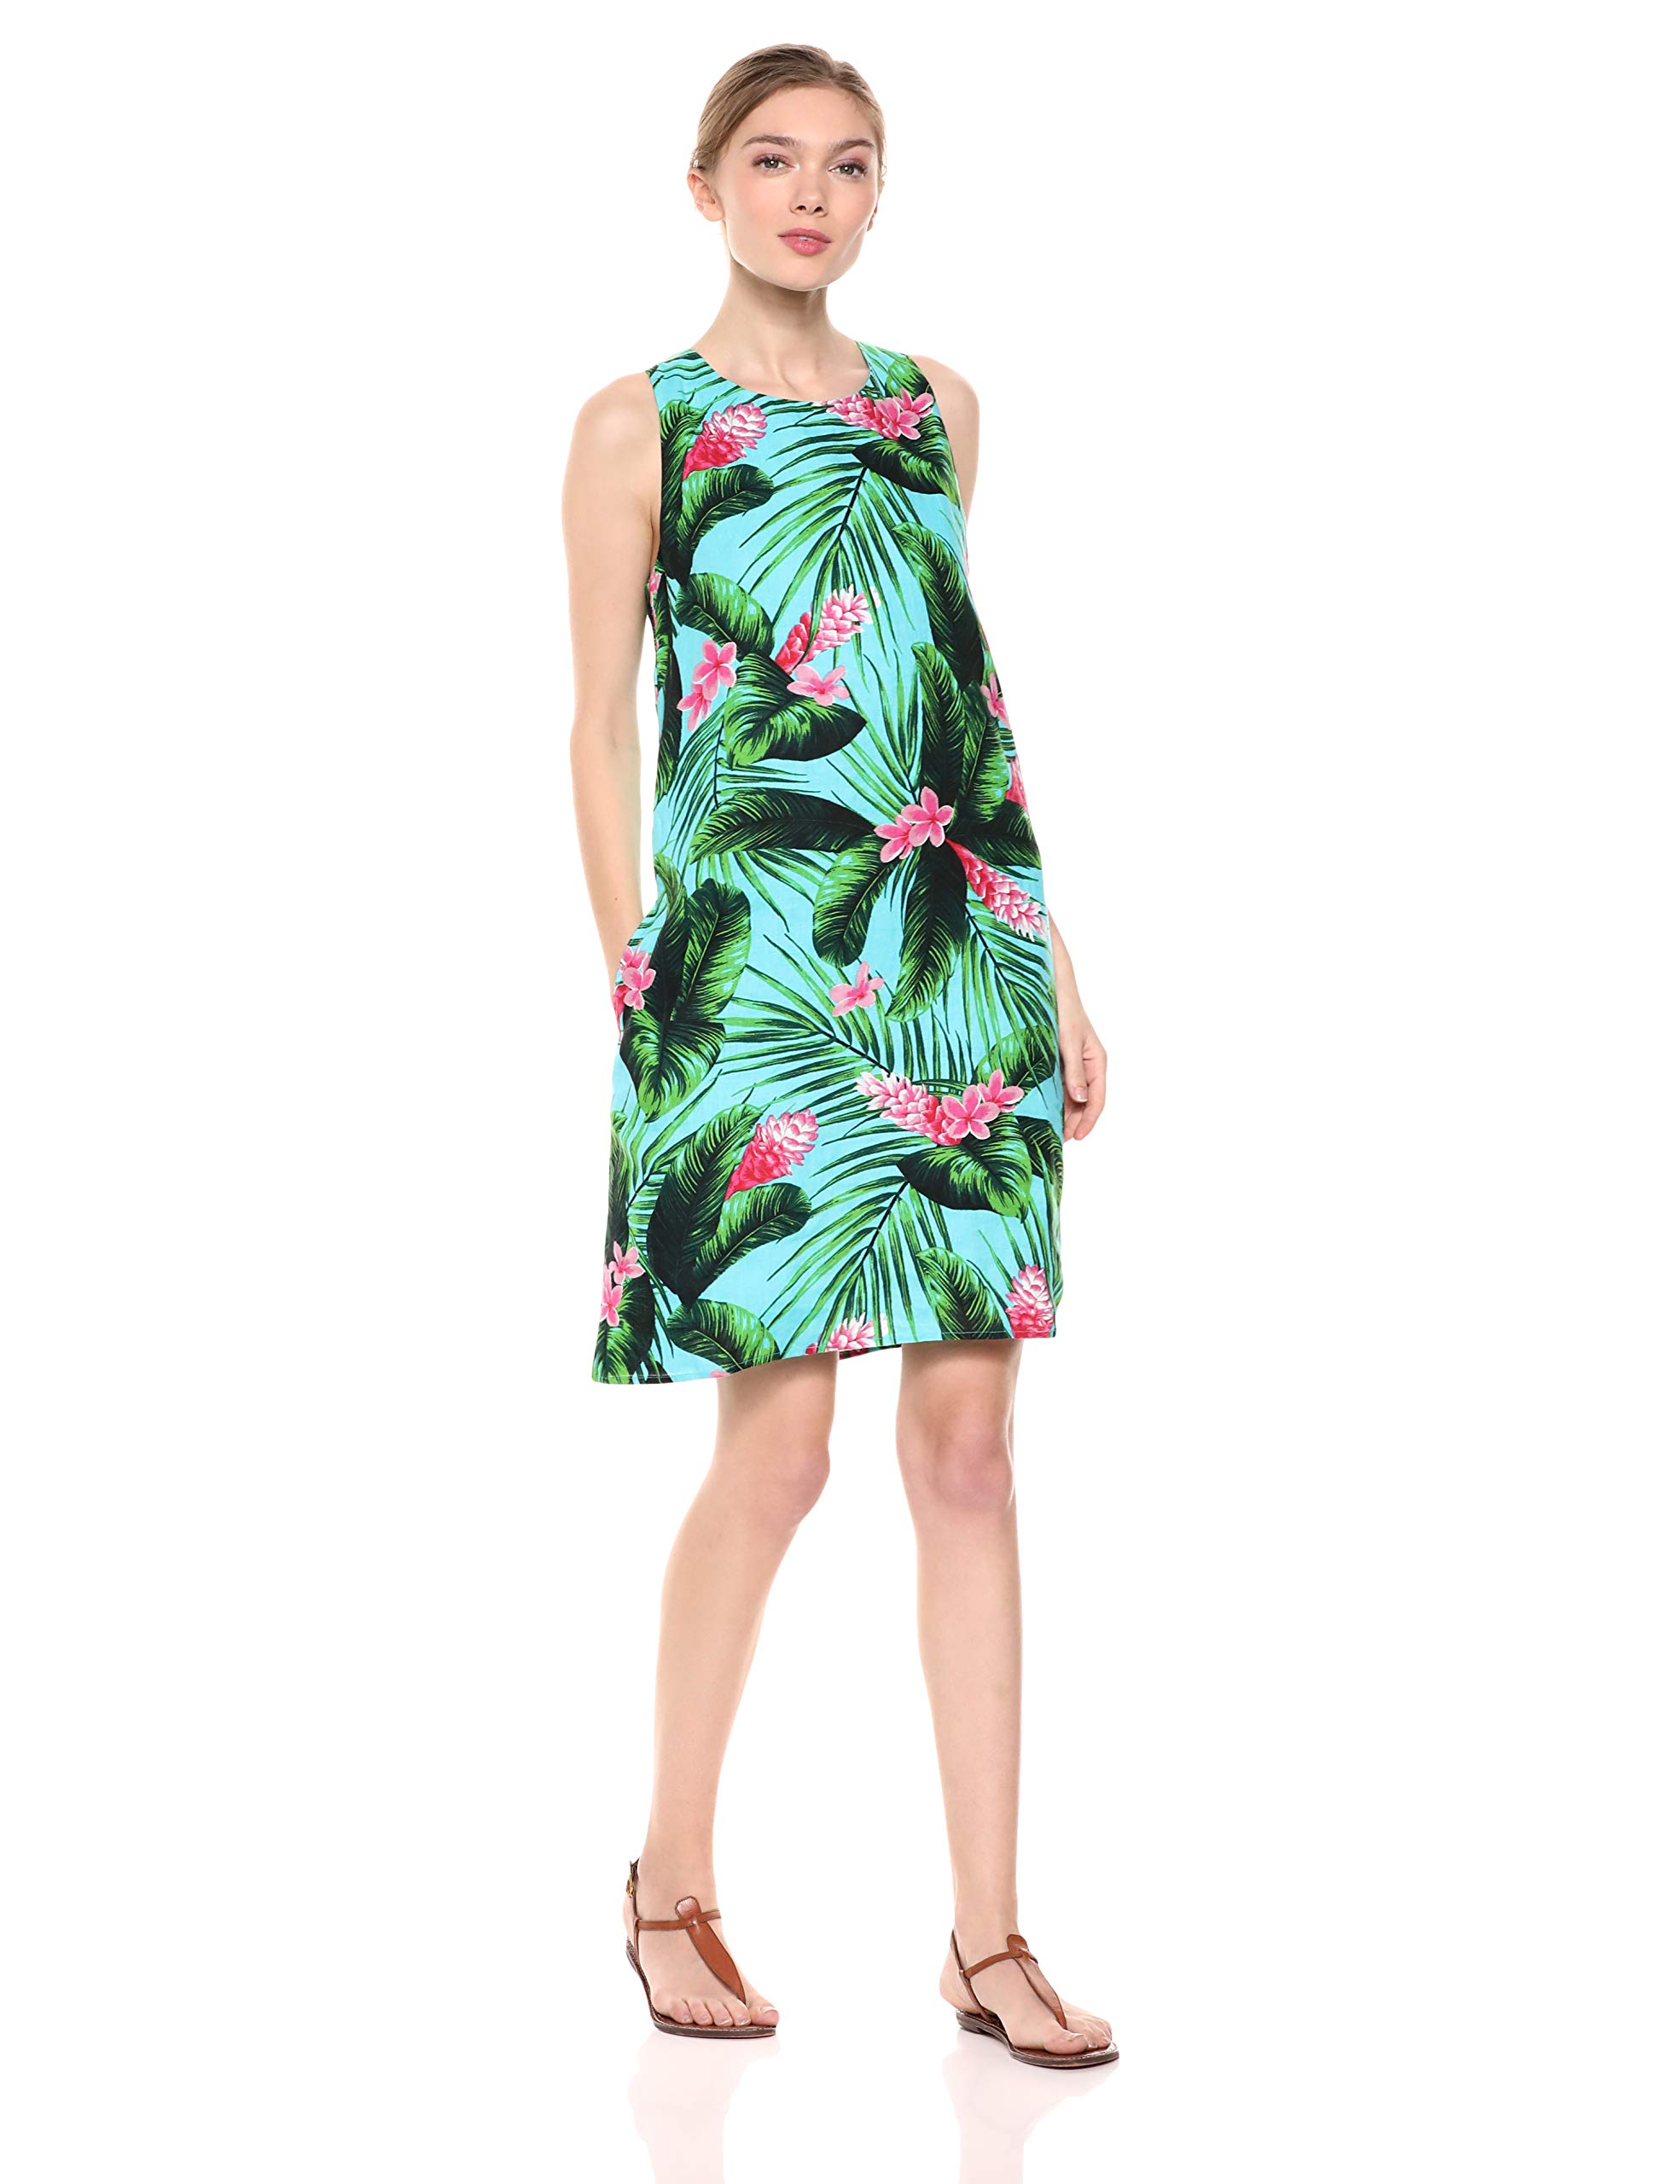 Shift TropicalUs Ginger LeuXl 28 Hawaiian Print DressAqua Palms 100Linen pink oQedrWCxBE